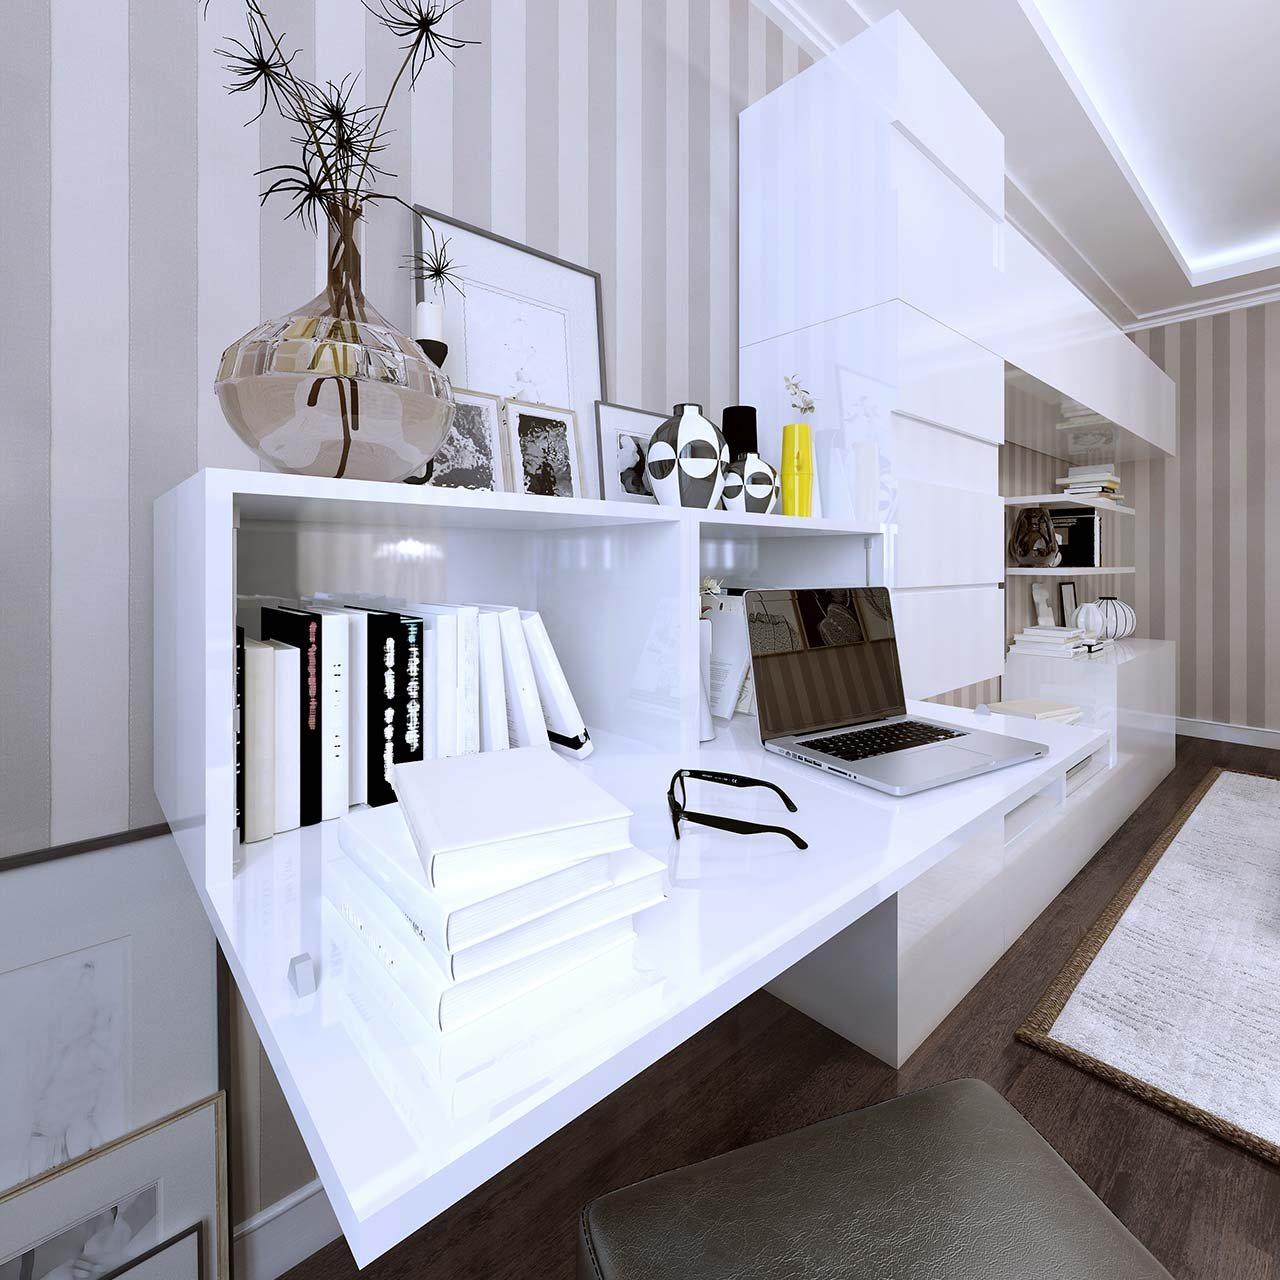 Foldable Furniture Fits Best